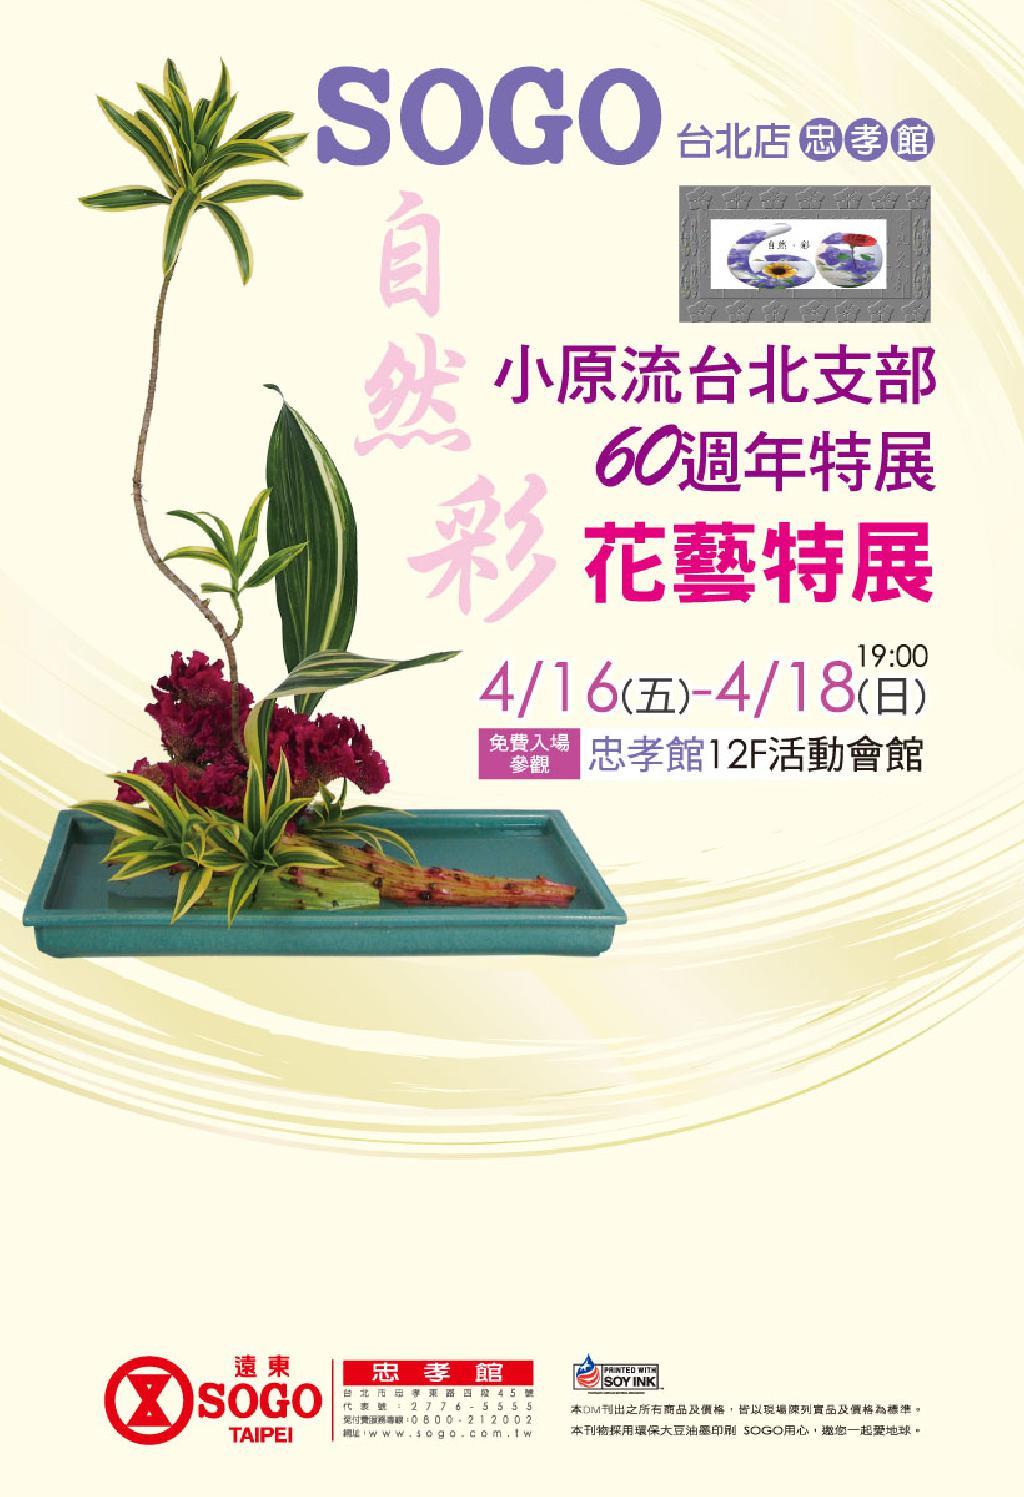 SOGO《台北忠孝館》DM 「12F活動會館「小原流台北支部60週年特展 花藝特展 自然.彩」」【2021/4/18 止】